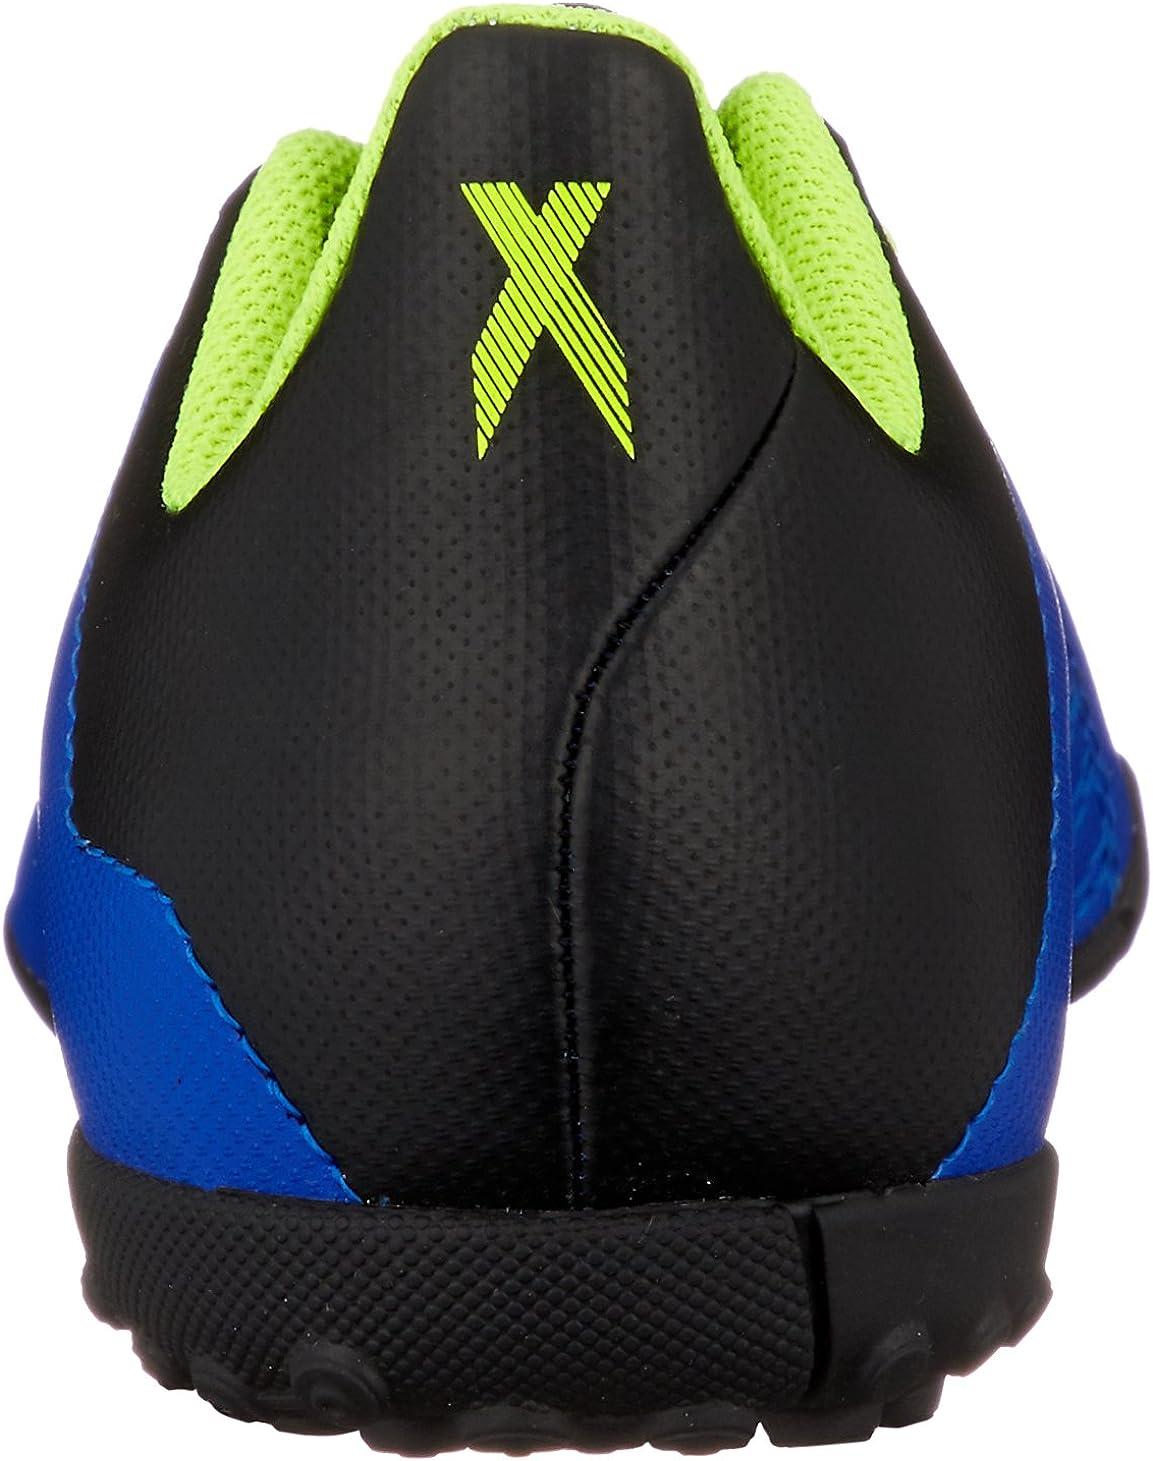 Botas de f/útbol Unisex Ni/ños adidas X Tango 18.4 TF J